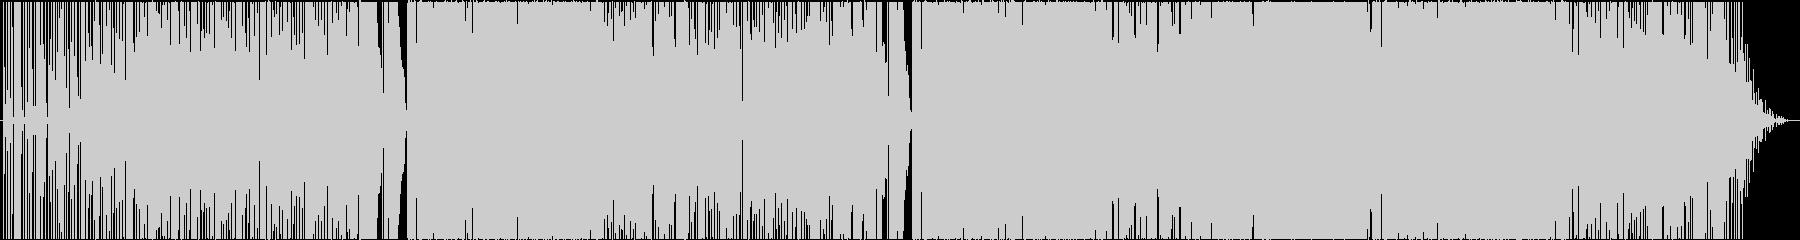 Echoの未再生の波形